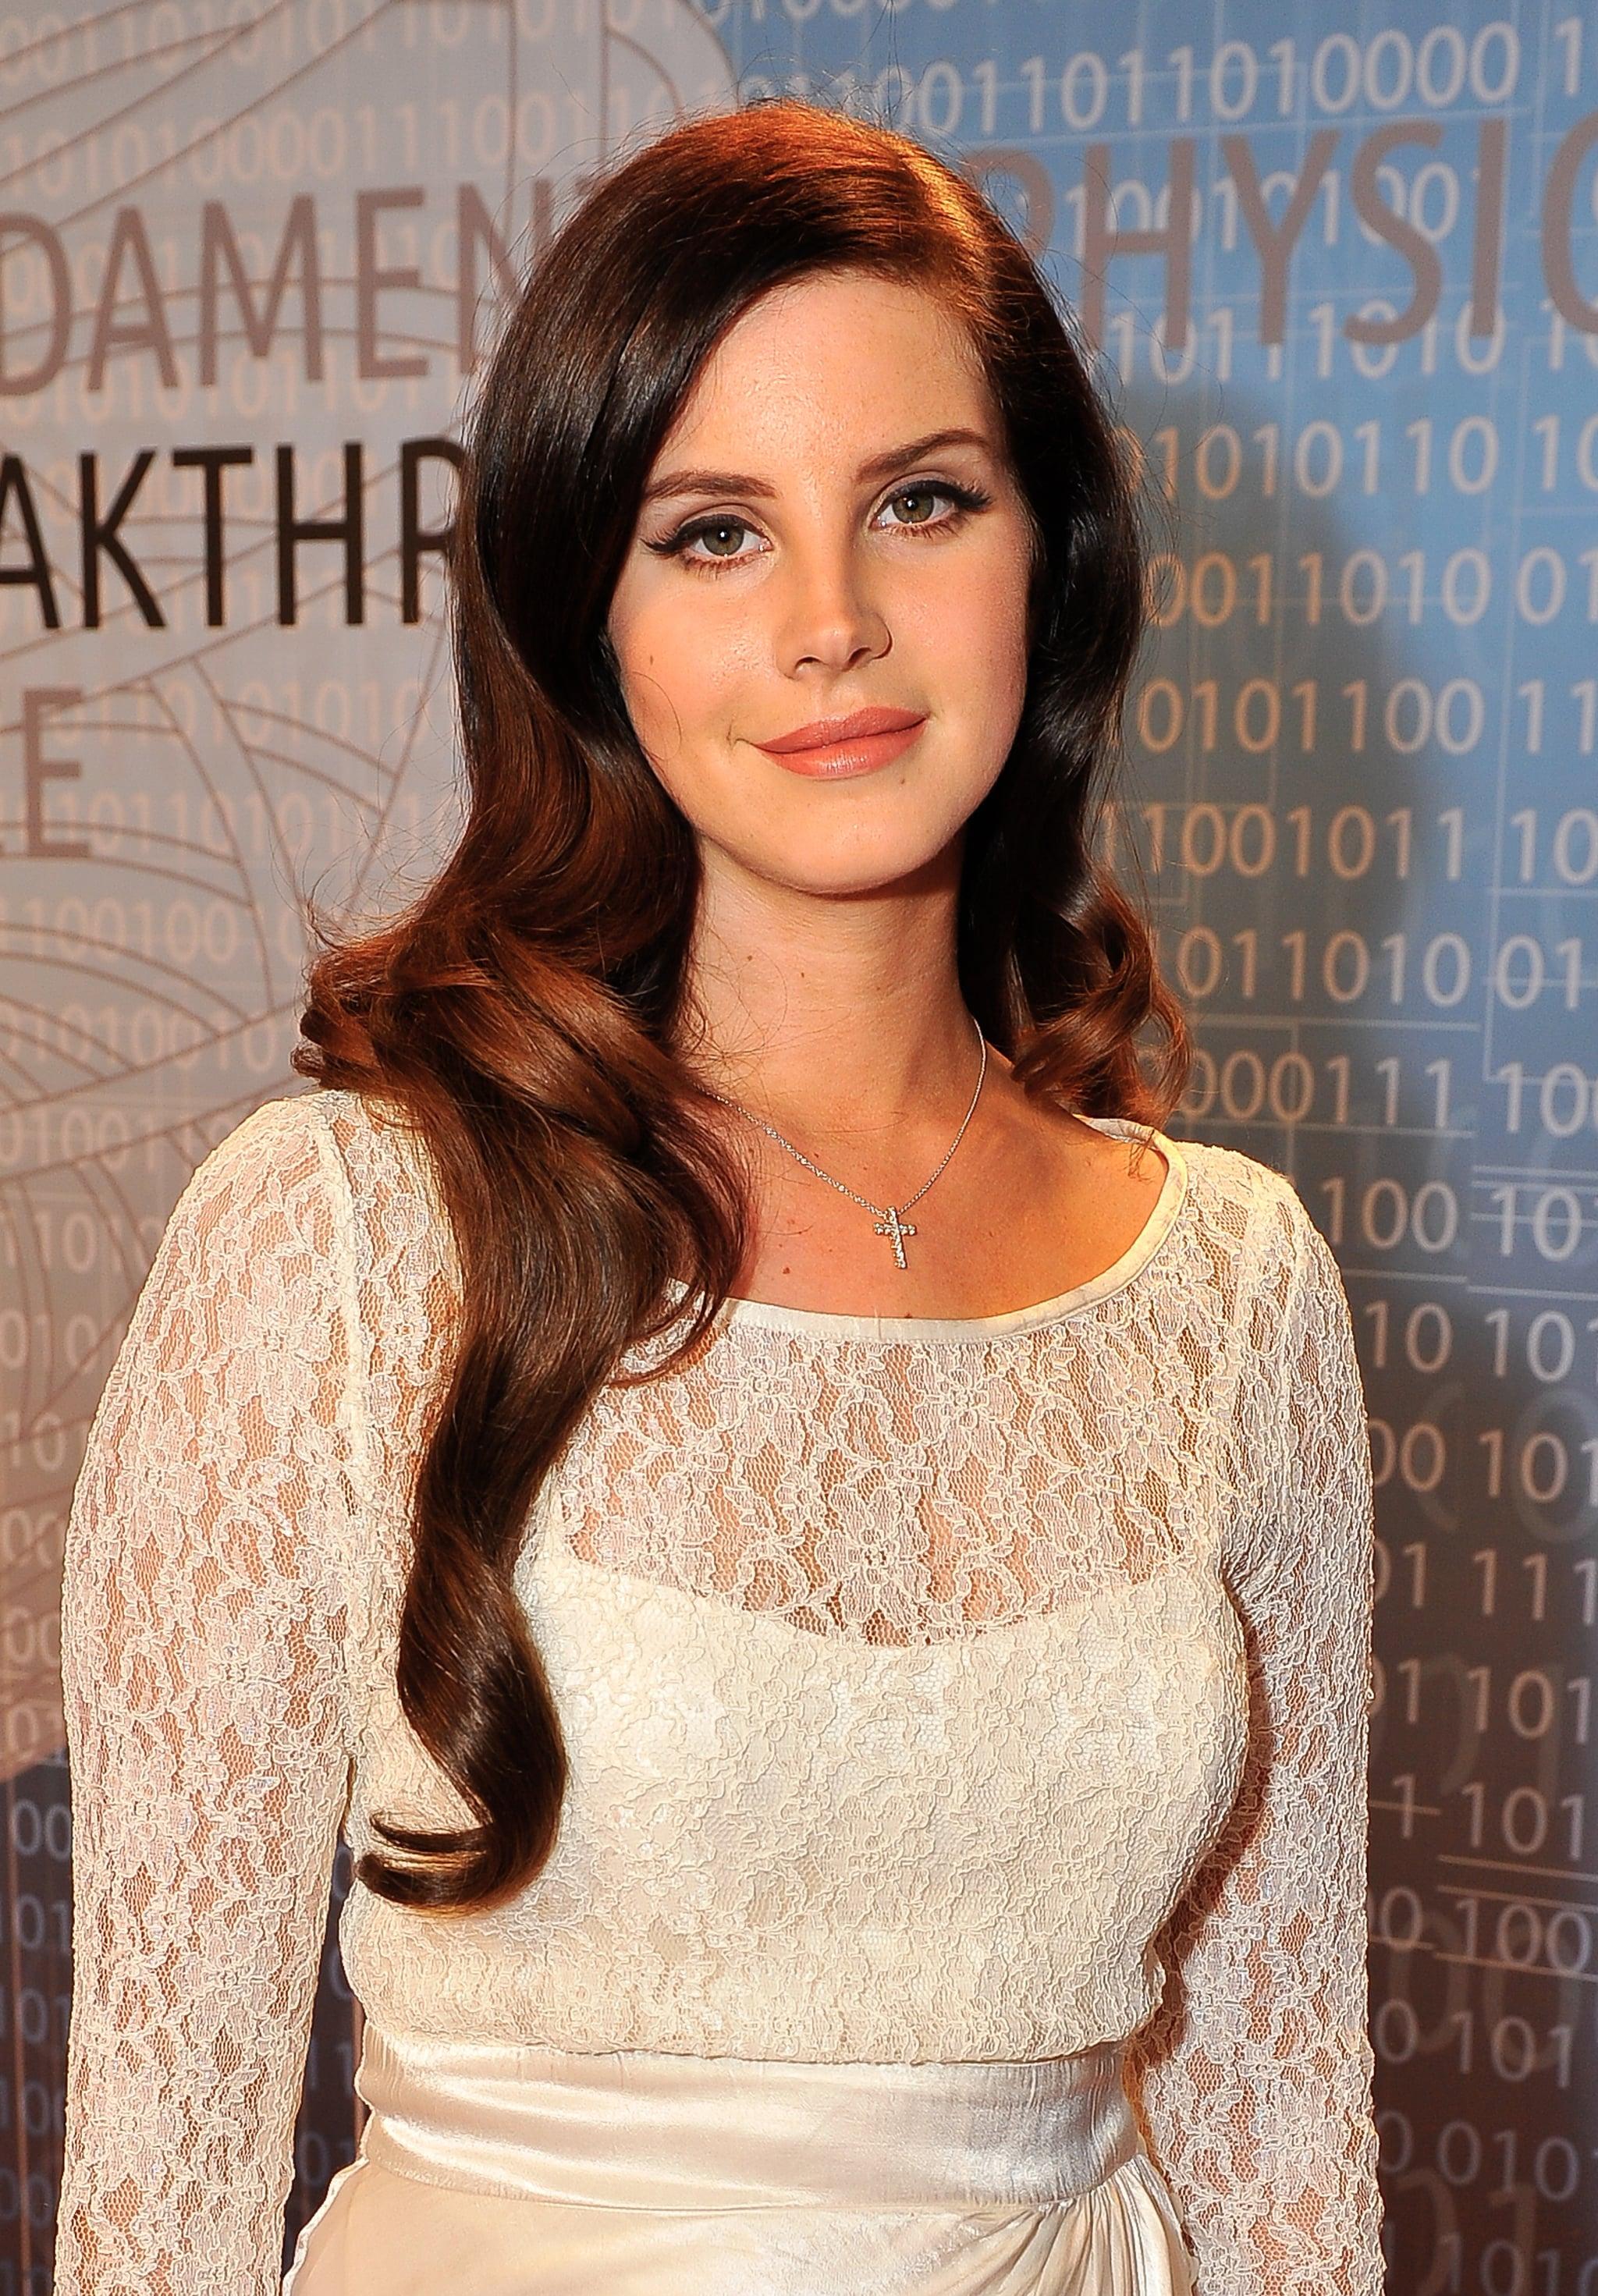 Lana Del Rey = Elizabeth Woolridge Grant